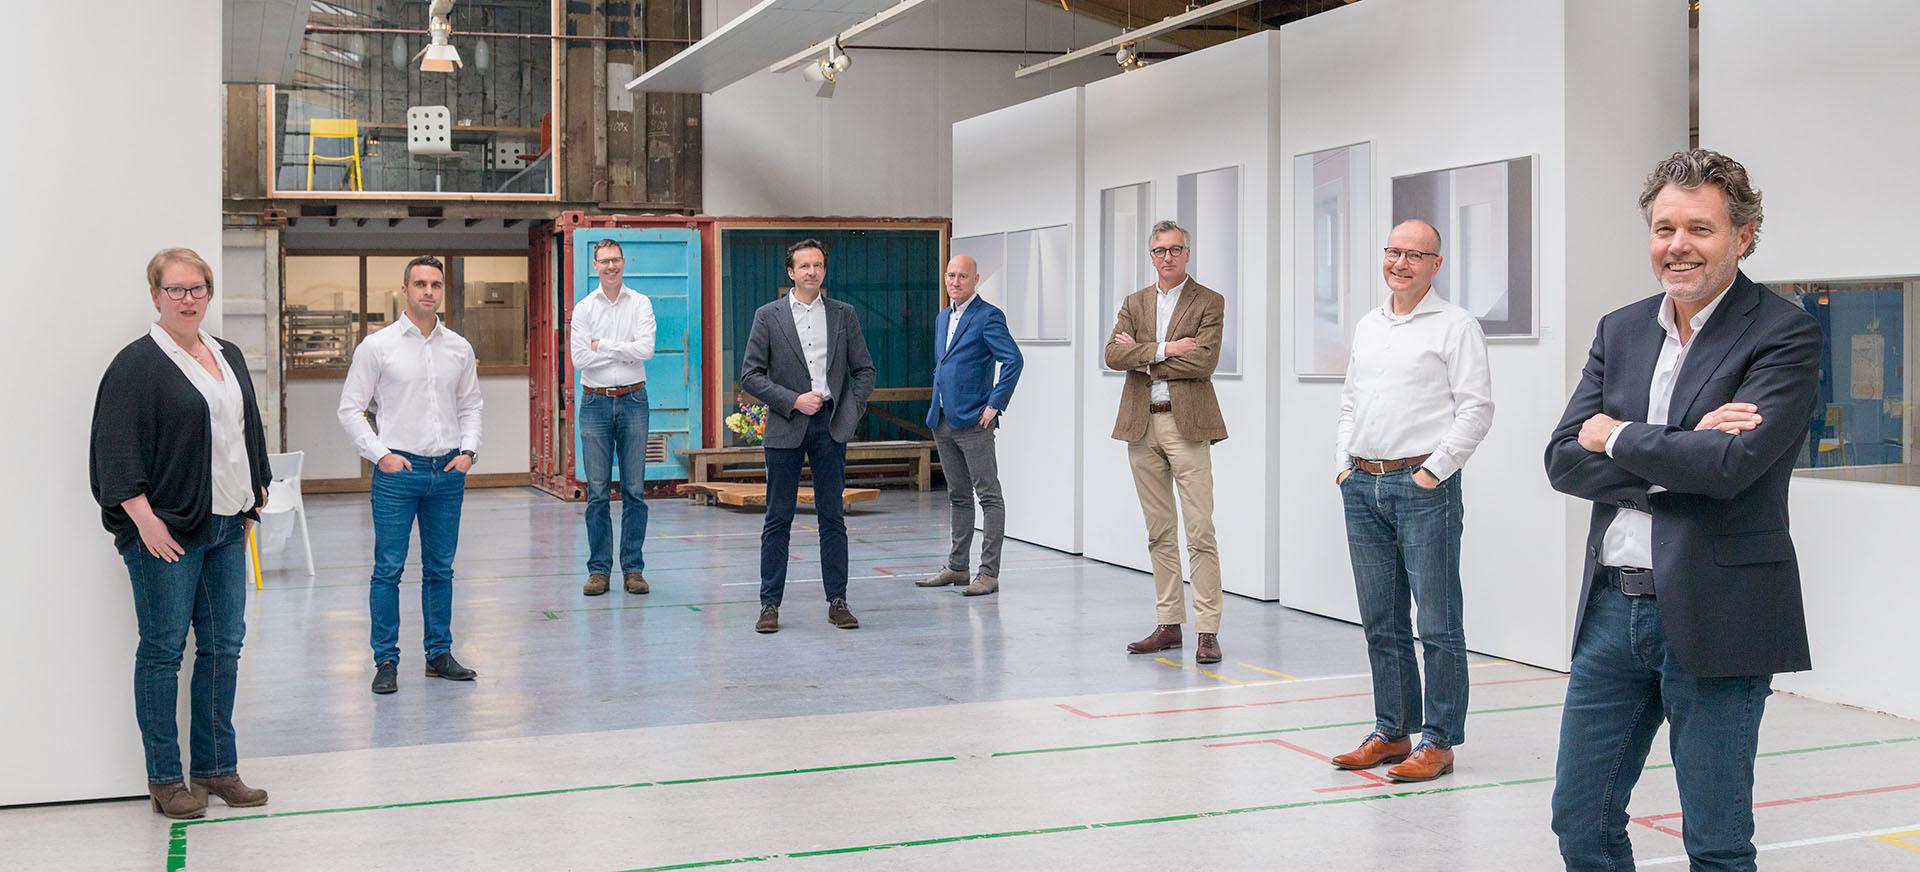 team Rodruza / Foto Thea van den Heuvel / DAPh